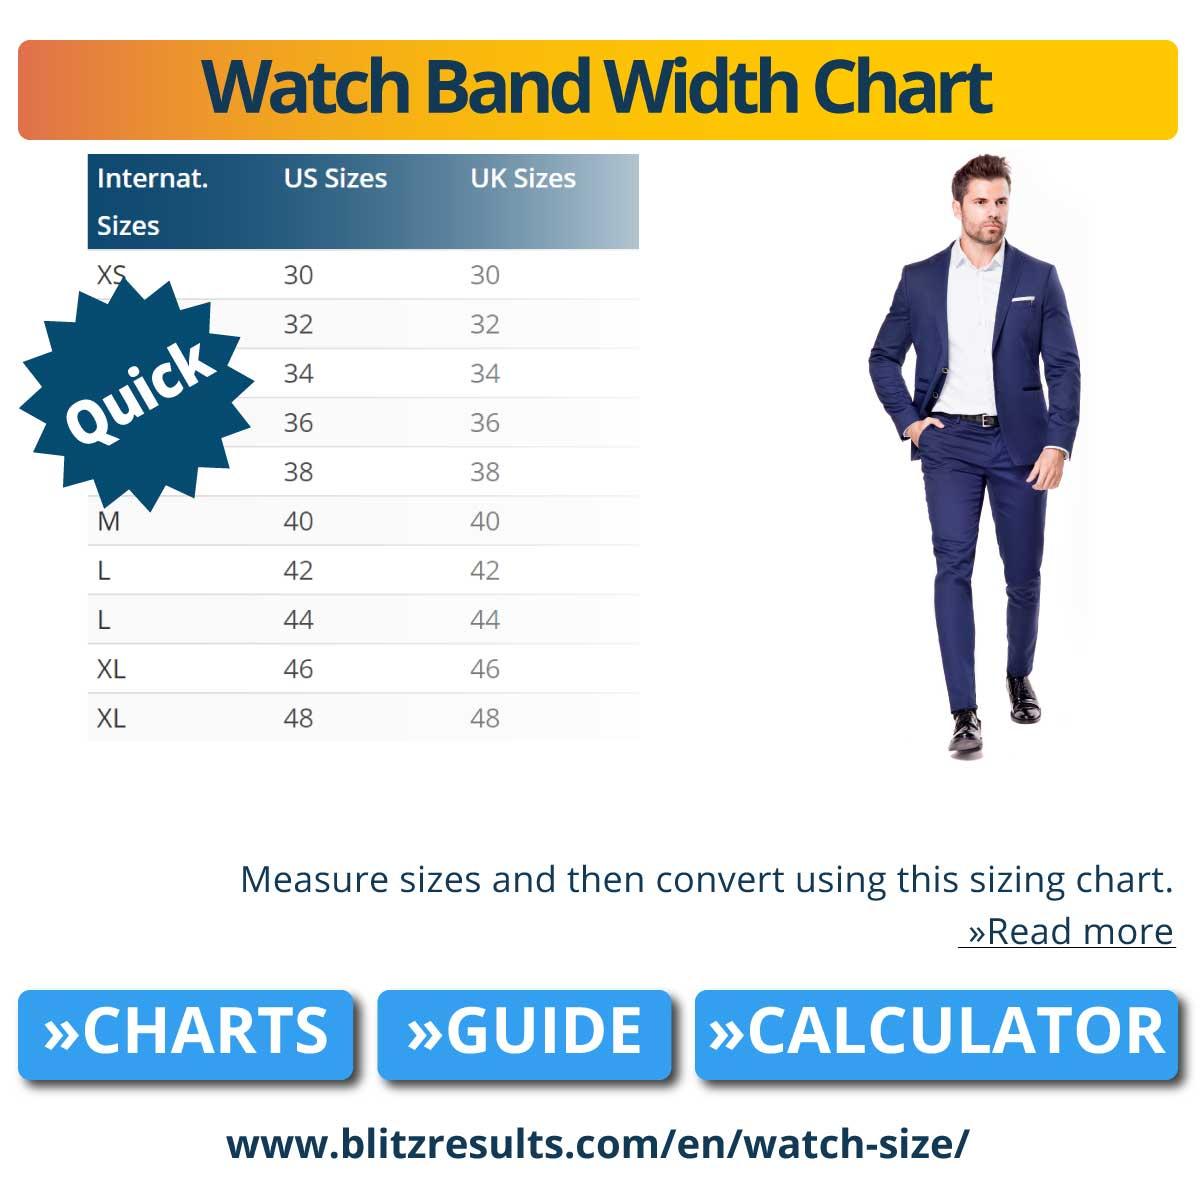 Watch Band Width Chart